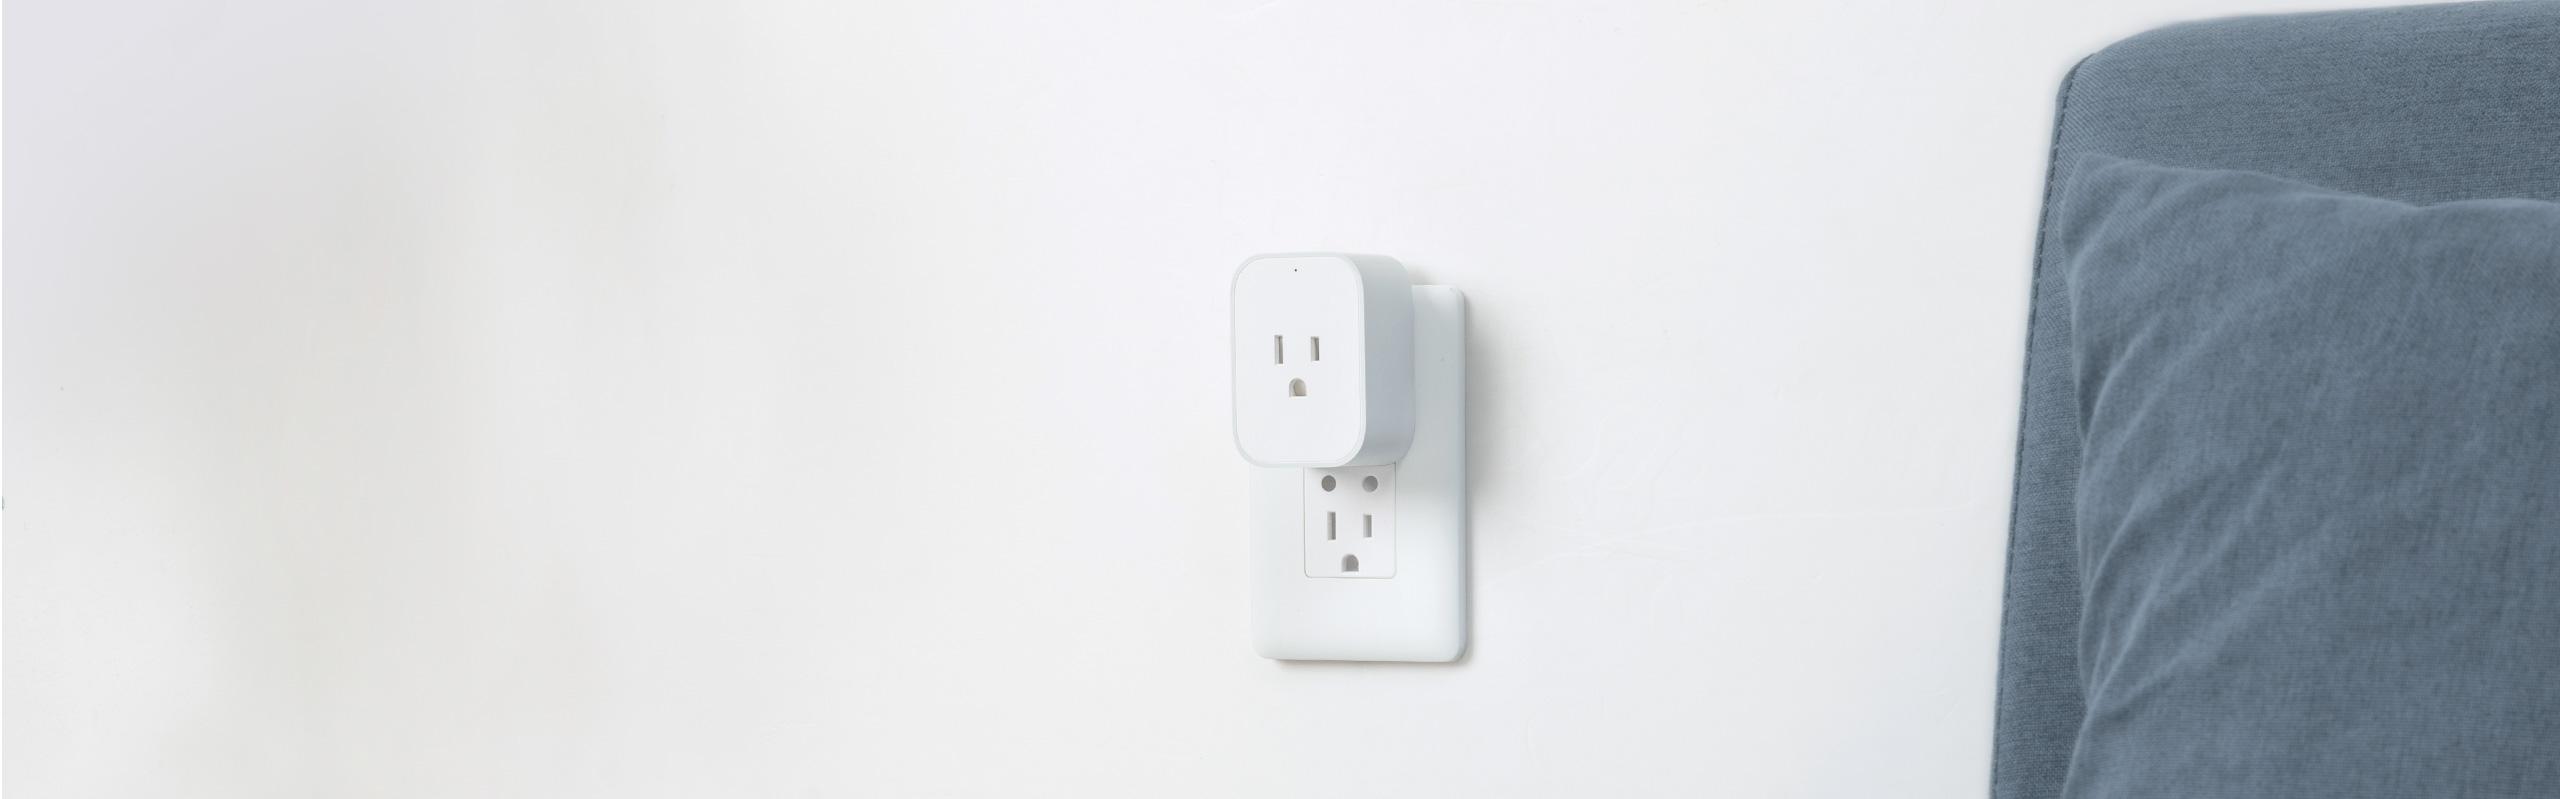 Aqara smart plug - smart outlet/socket working with Google Home, HomeKit and Alexa.